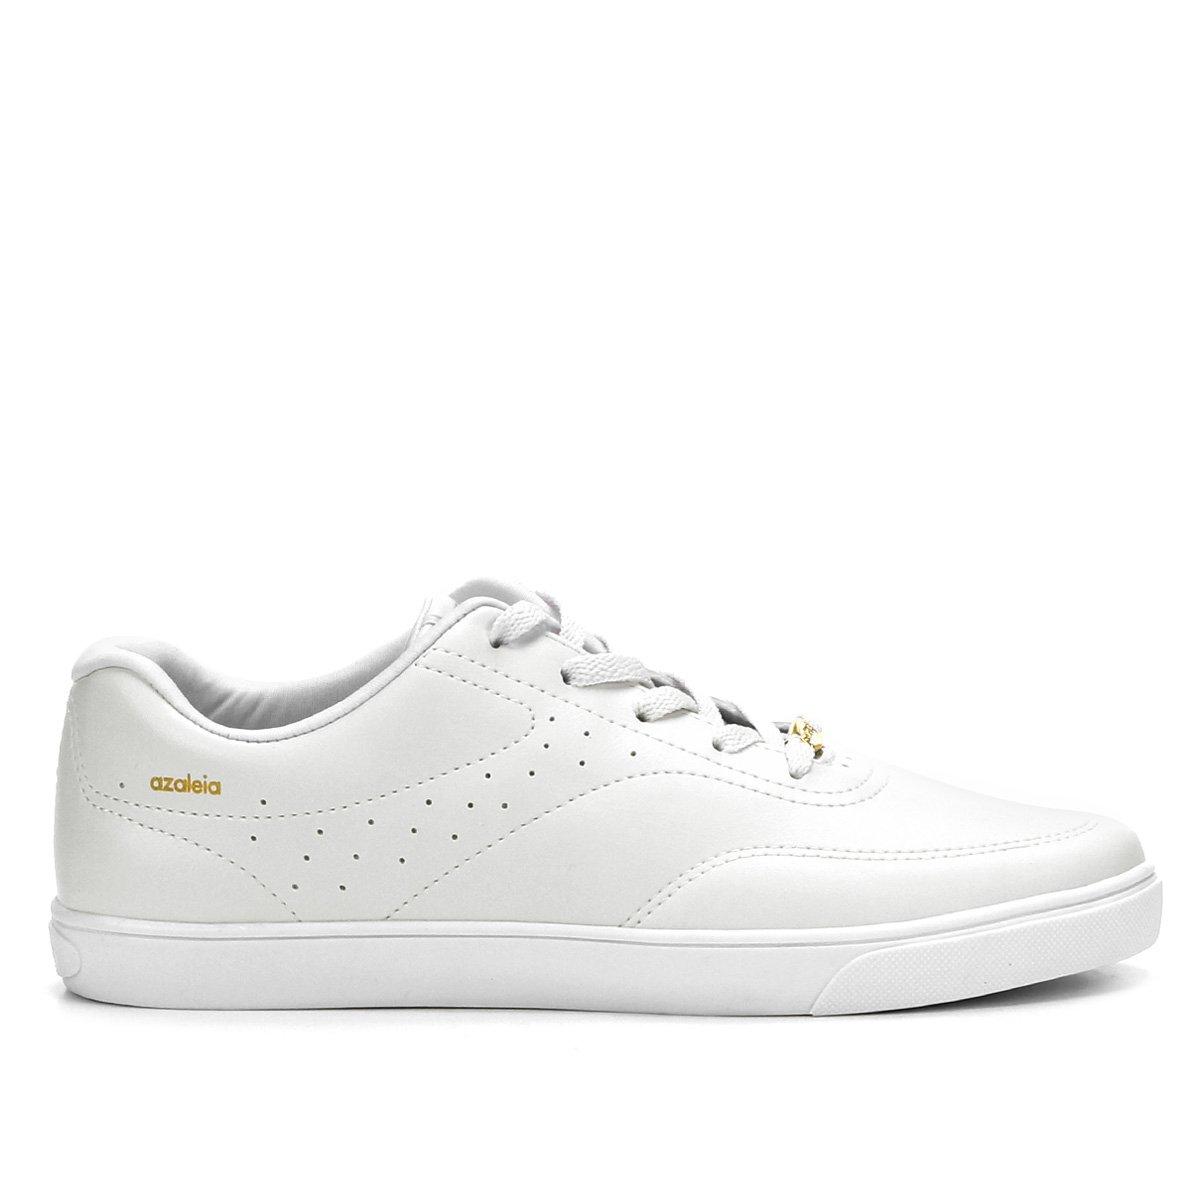 c4f4f3c5890 Tênis Azaleia Básico Perfuros Feminino - Branco - Compre Agora